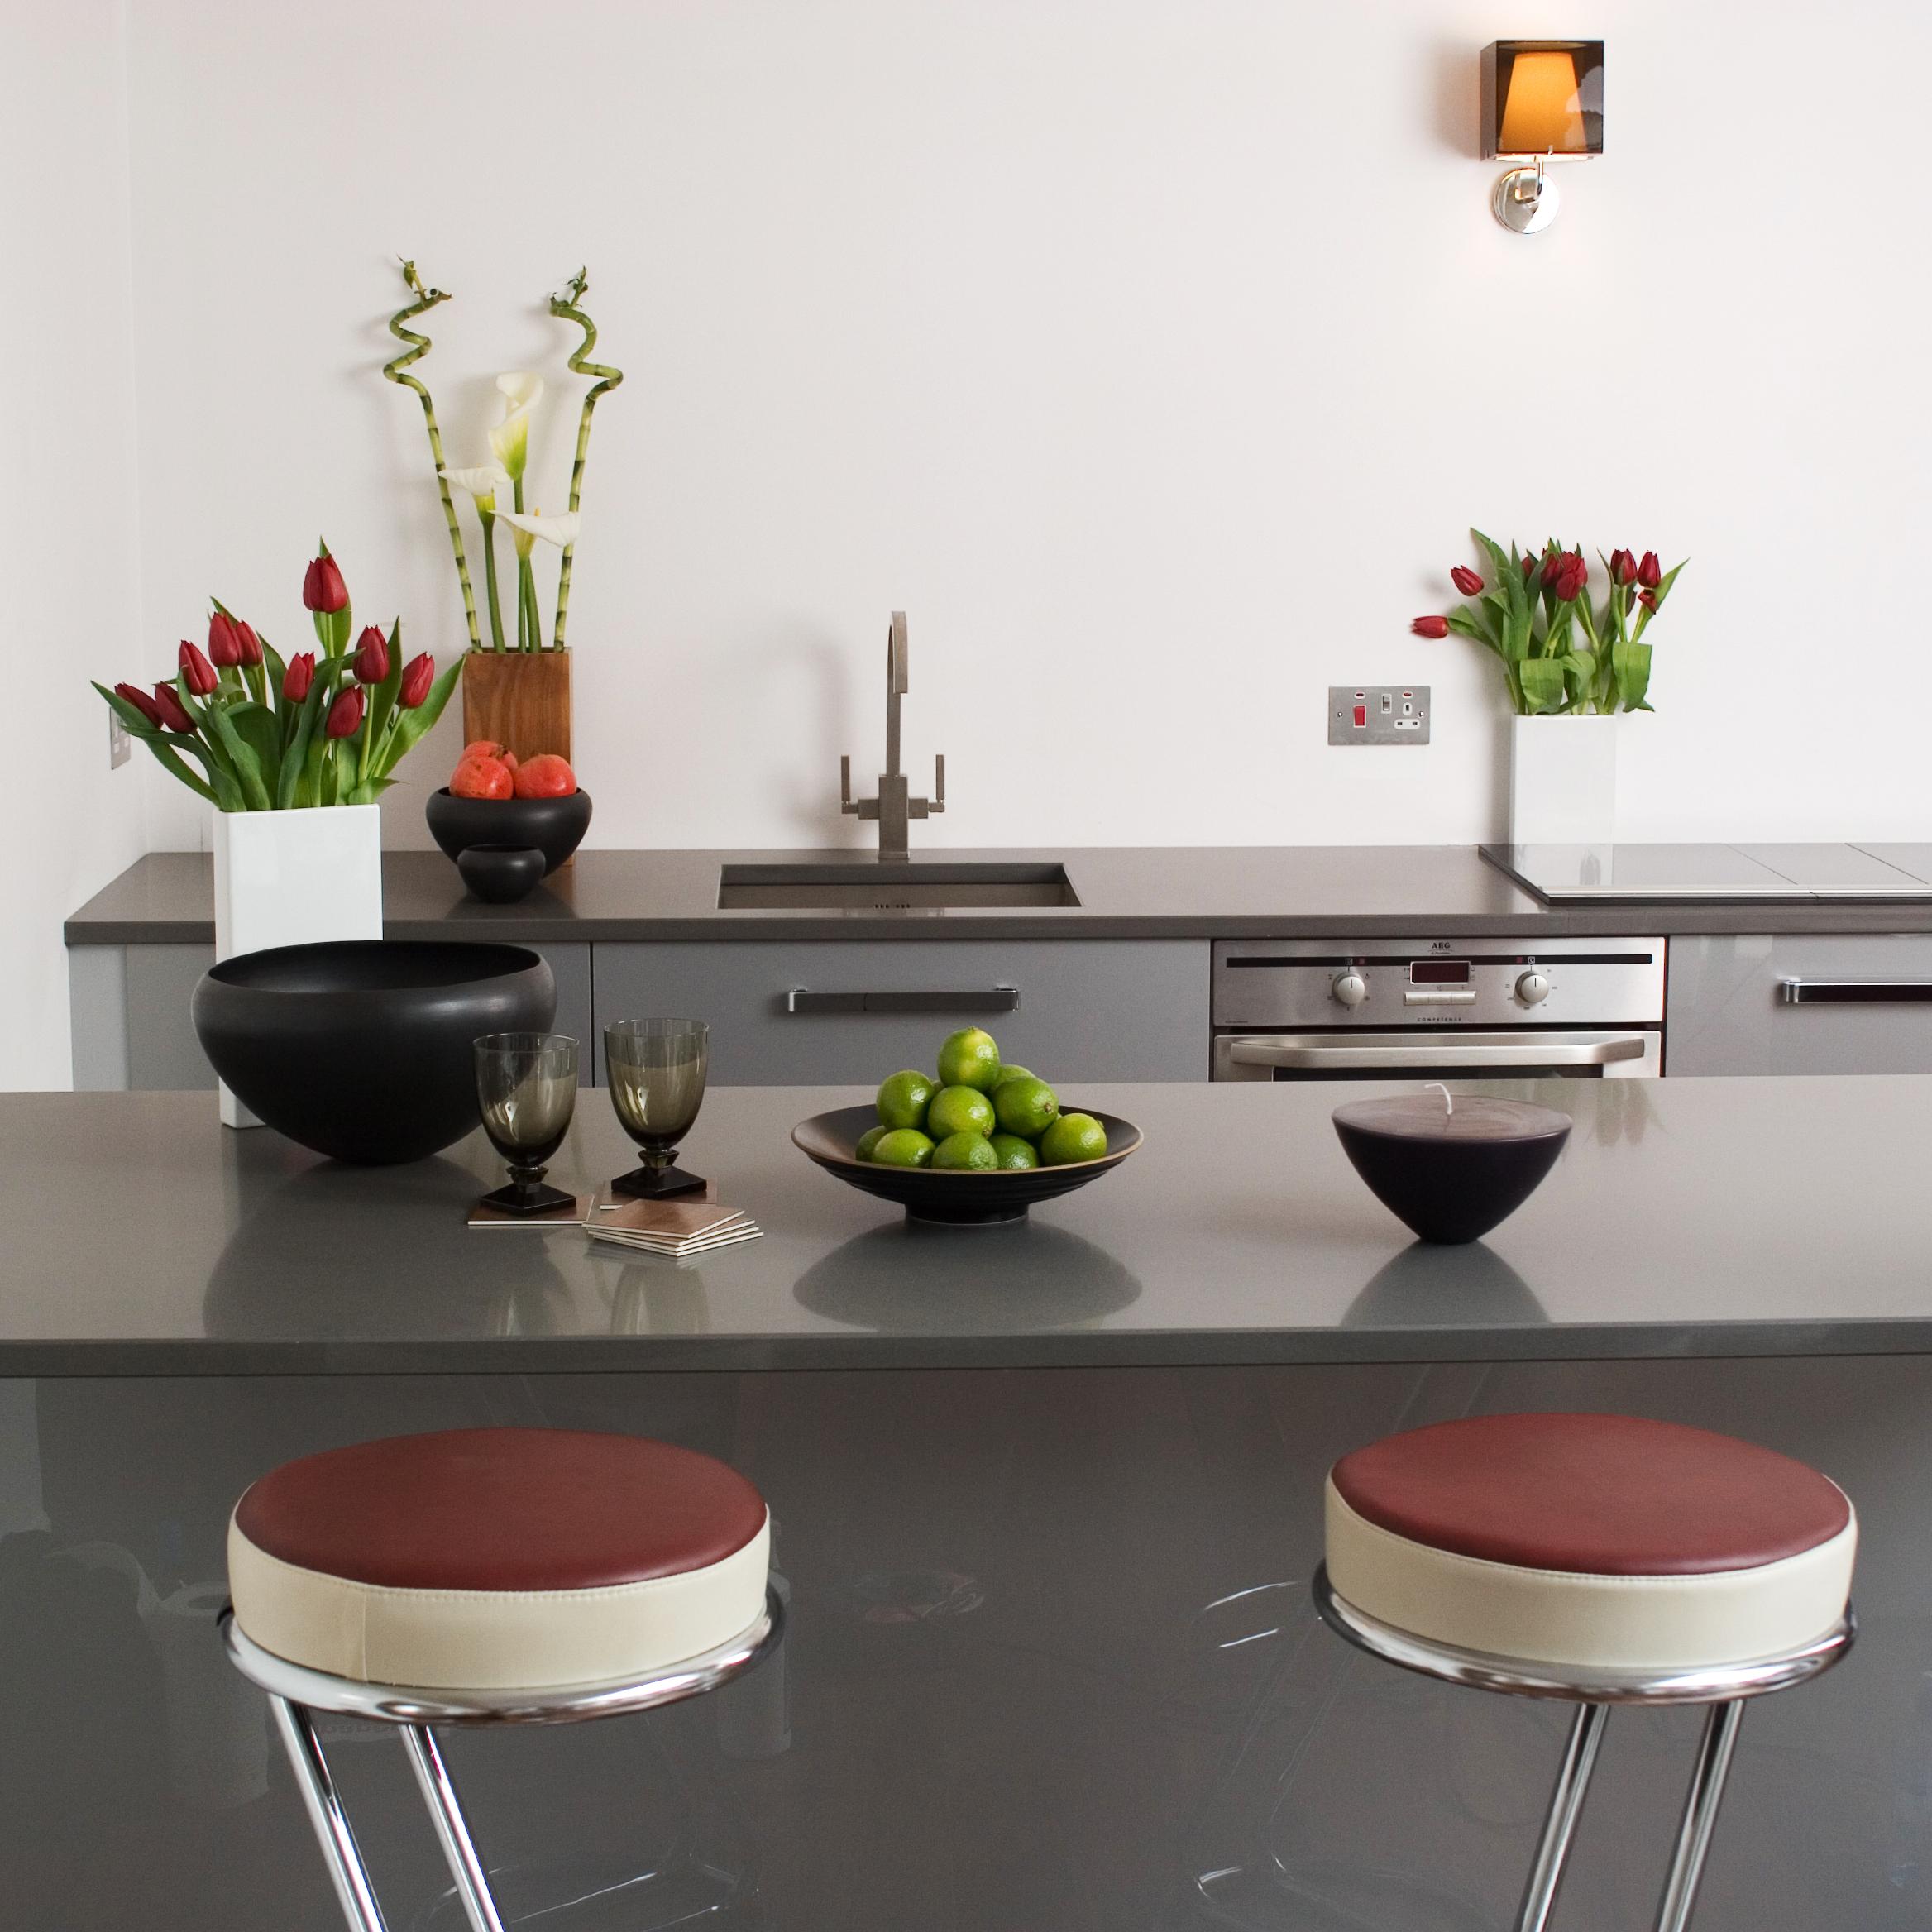 Fashionable kitchens